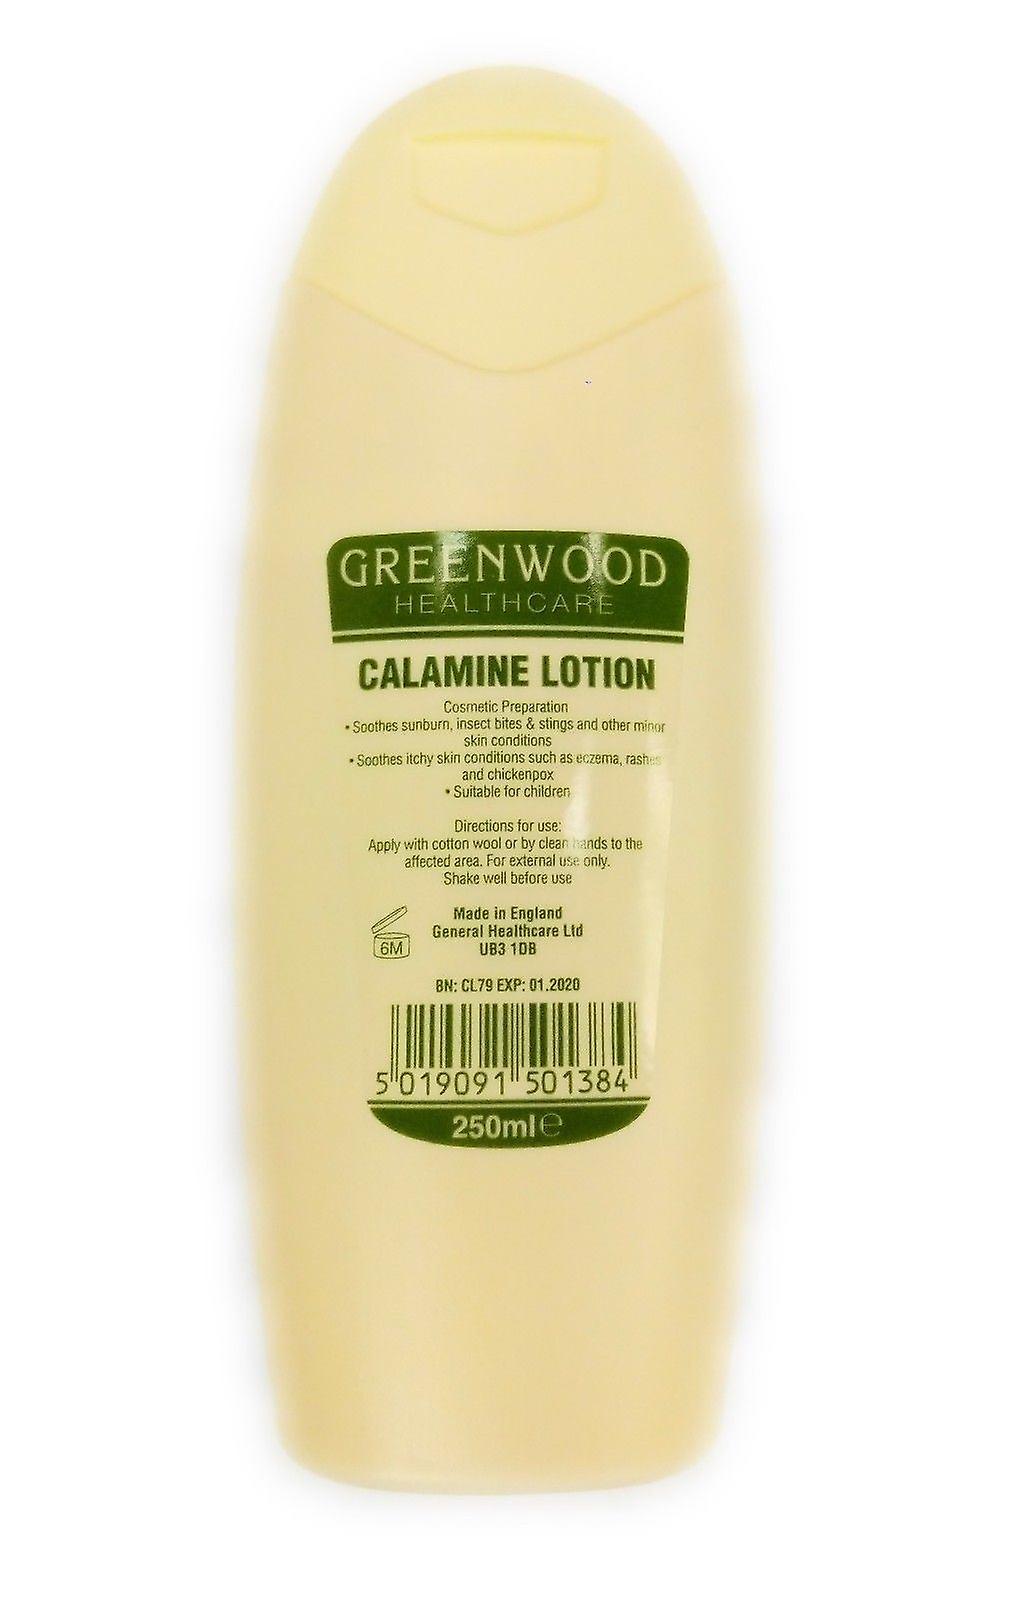 GreenWood Calamine Lotion Smooths sunburn, bites, itchy skin, stings, chickenpox